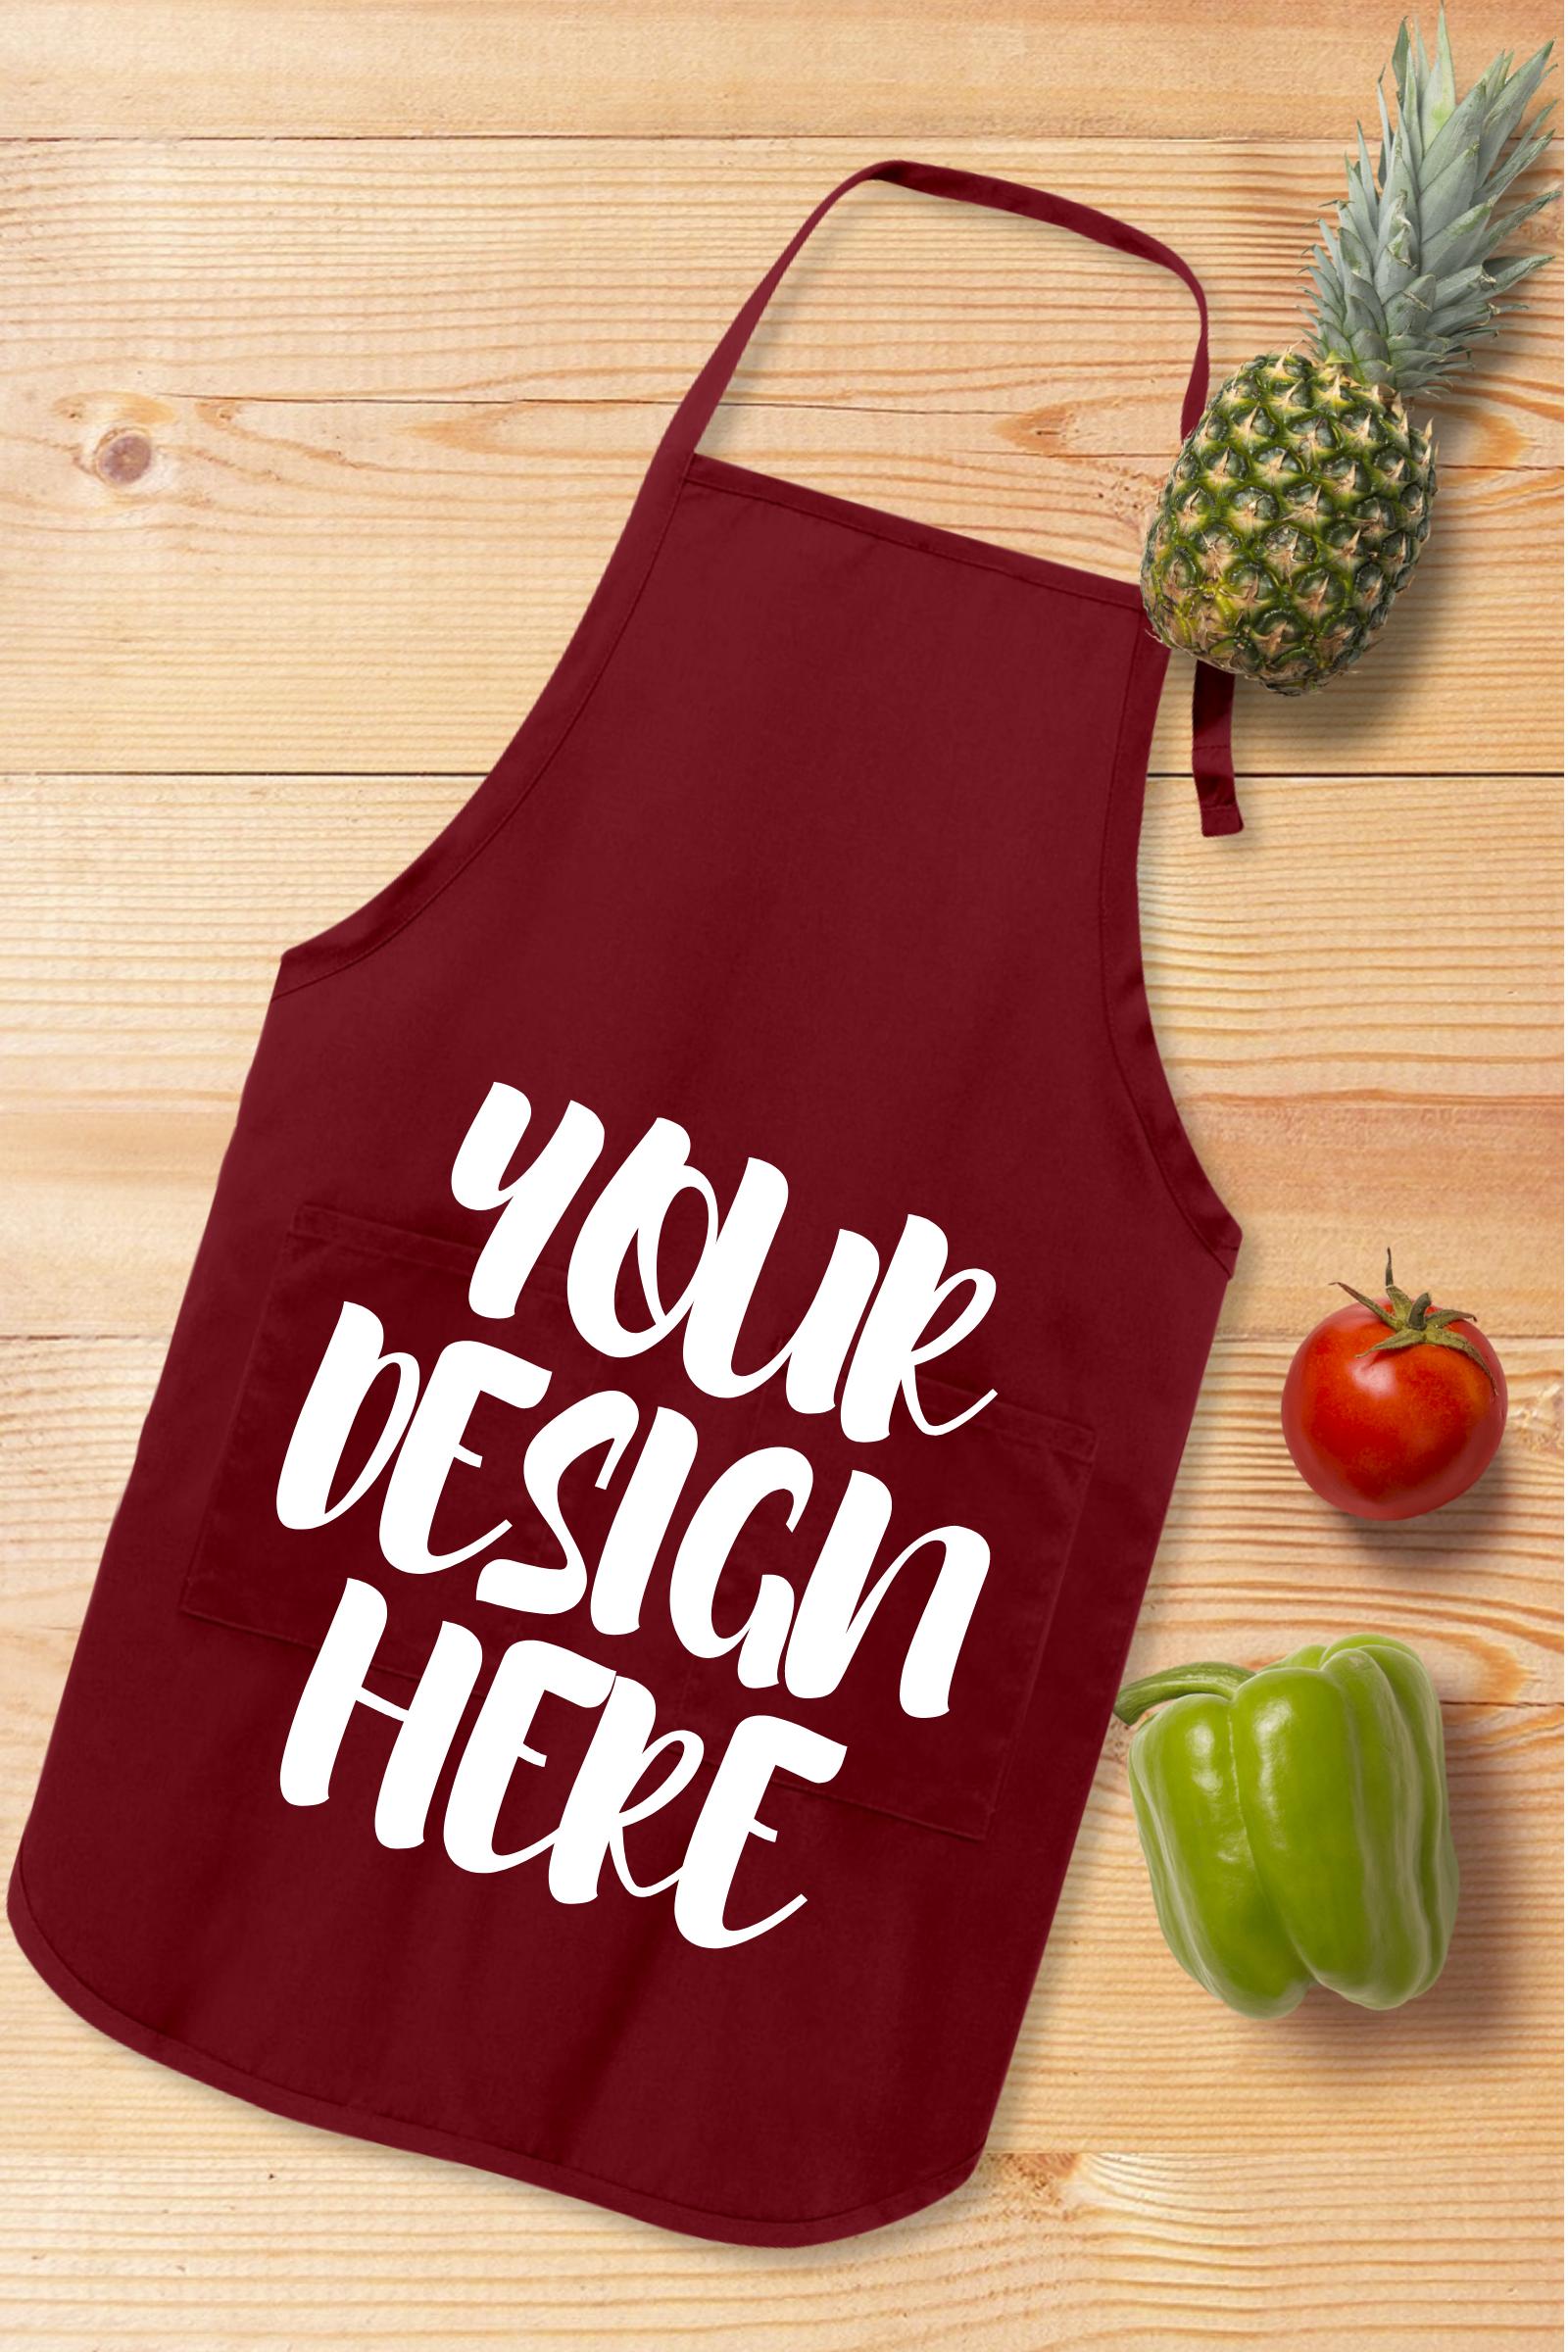 Apron Mock Ups Bundle With Kitchen Theme - 6 example image 6